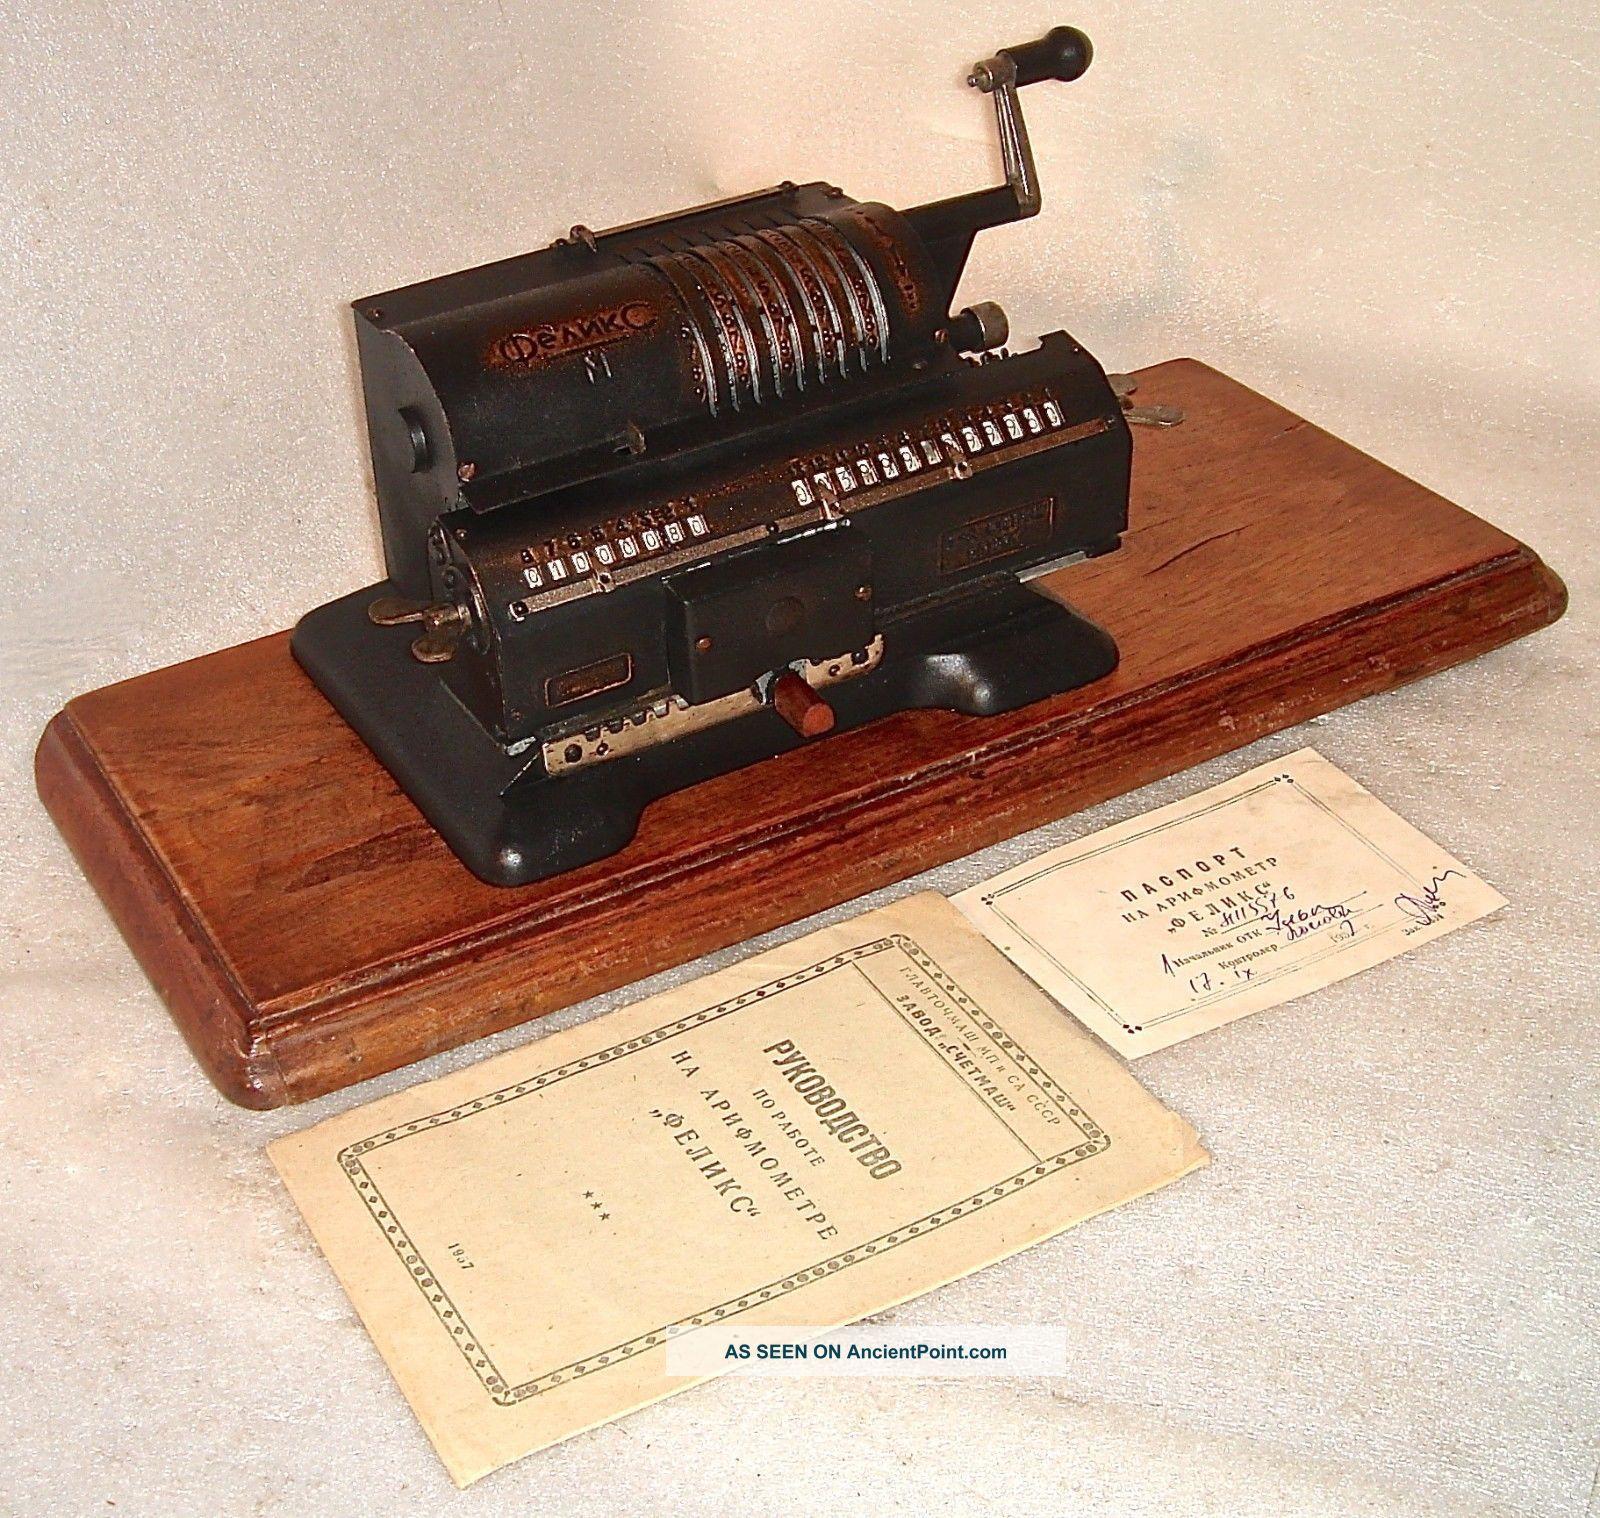 1928 Antique Russian Mechanical Calculator Arithmometer Feliks Kursk Cash Register, Adding Machines photo